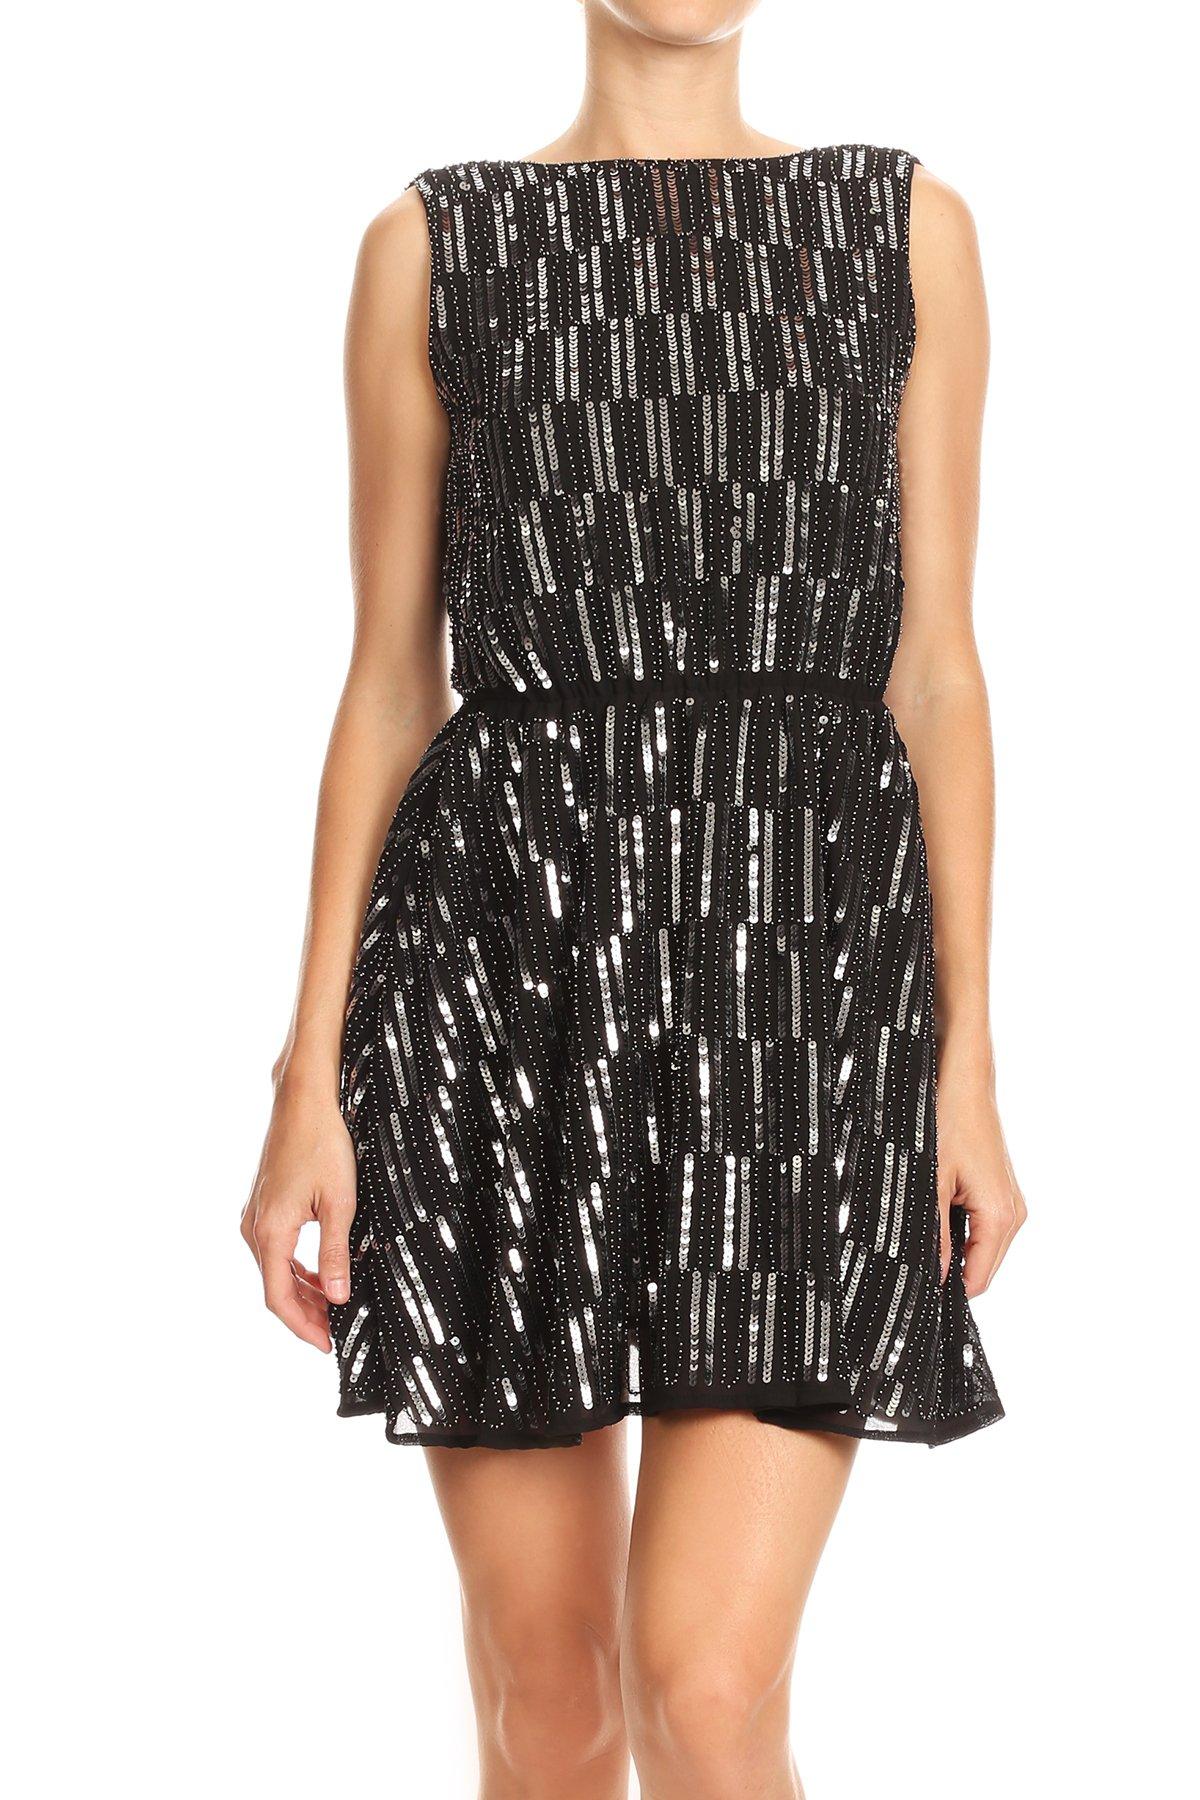 Anna-Kaci Womens Backless Sleeveless Sequin Stripe Mini Dress with Deep V Back, Black, X-Large